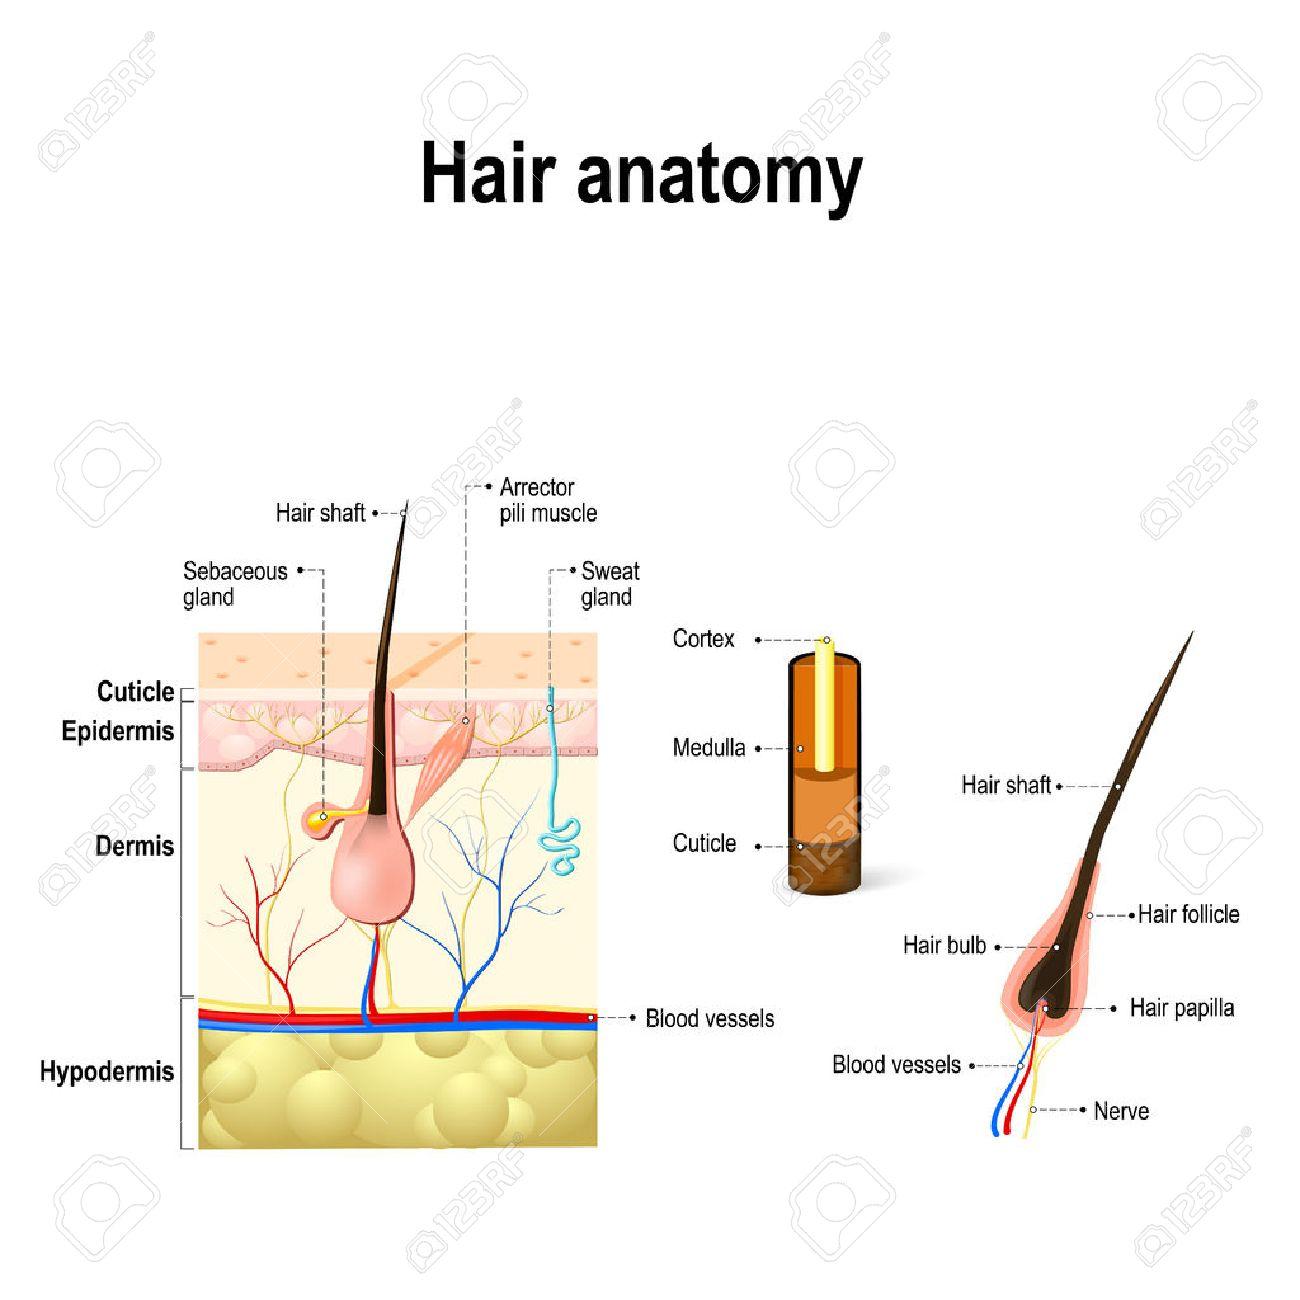 hight resolution of human hair anatomy diagram of a hair follicle and cross sectionhuman hair anatomy diagram of a